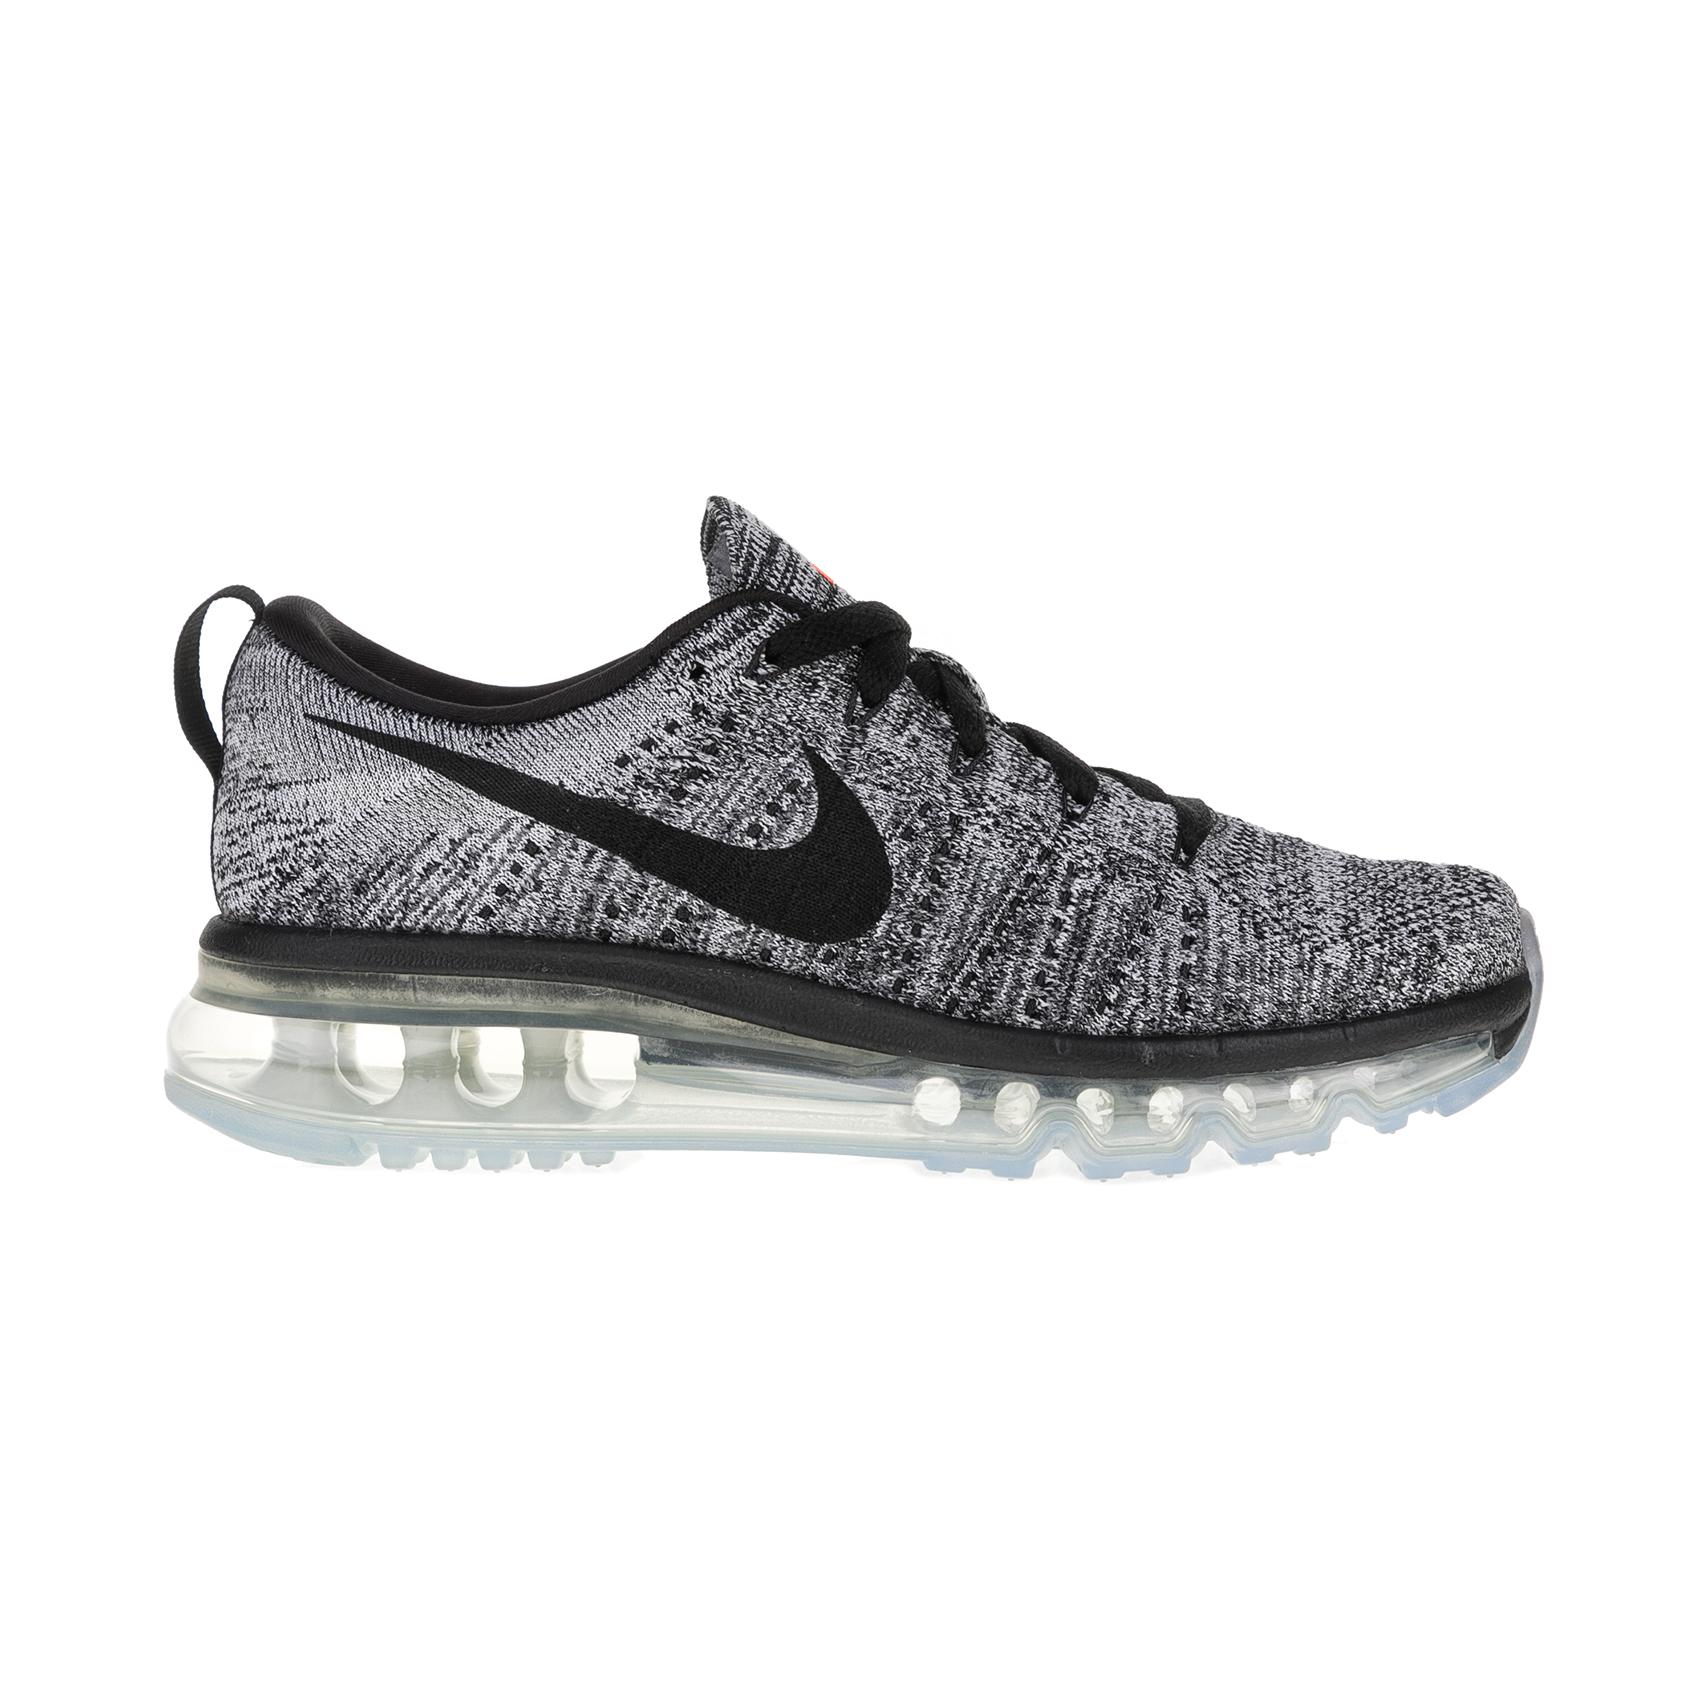 NIKE – Γυναικεία αθλητικά παπούτσια Nike FLYKNIT MAX γκρι